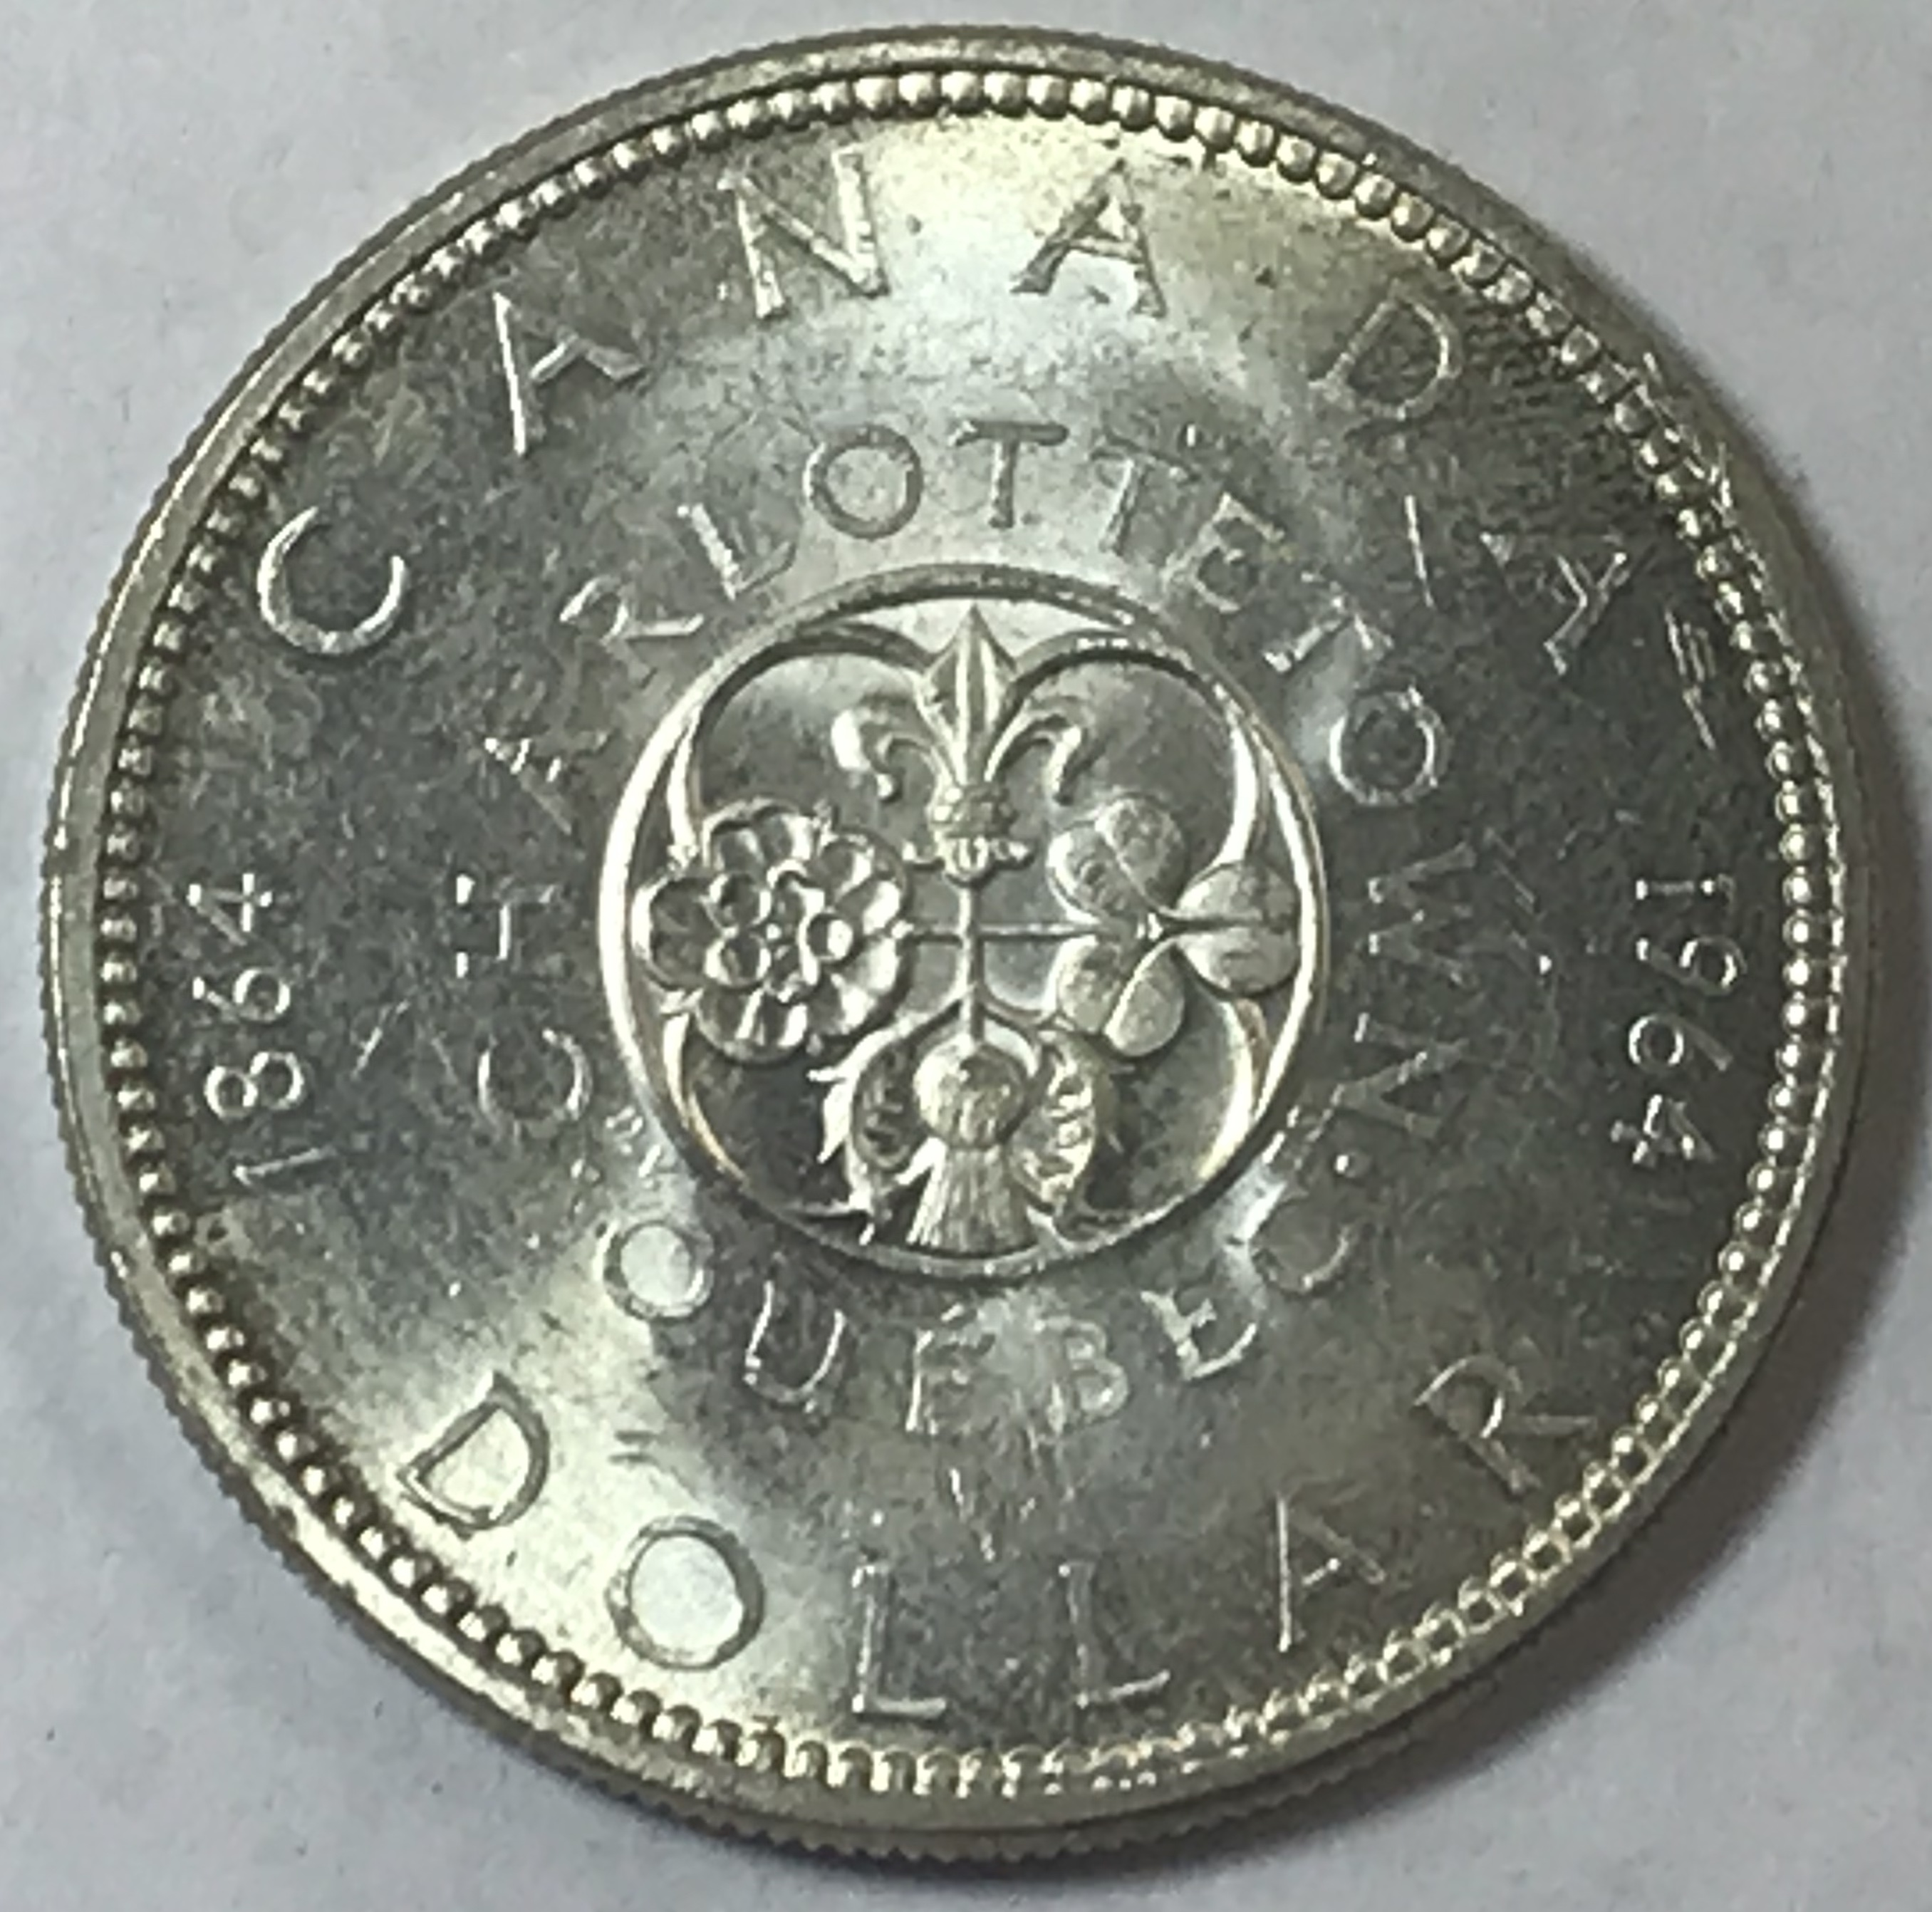 1964 Canada Proof Like Silver Dollar $1 Centennial Coin